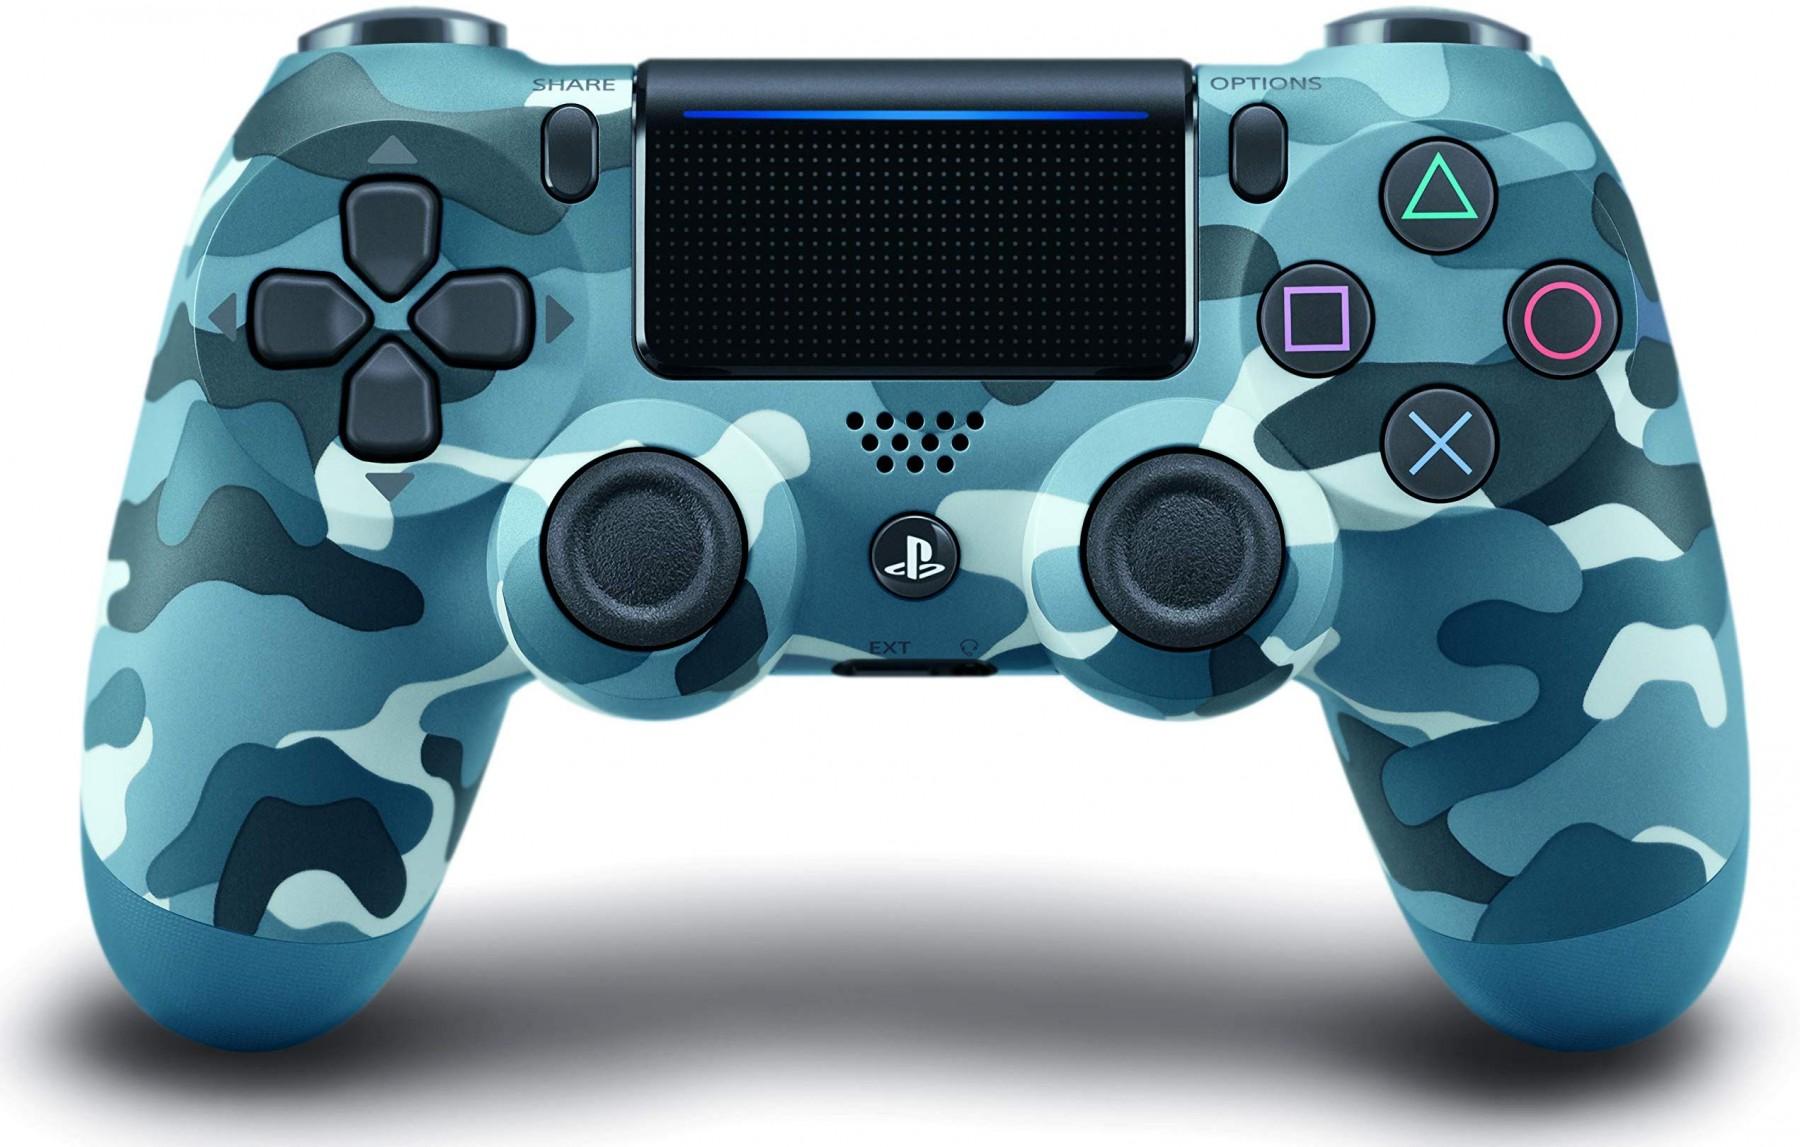 Беспроводной контроллер/джойстик/геймпад DualShock 4 Wireless Controller Blue Camouflage V2